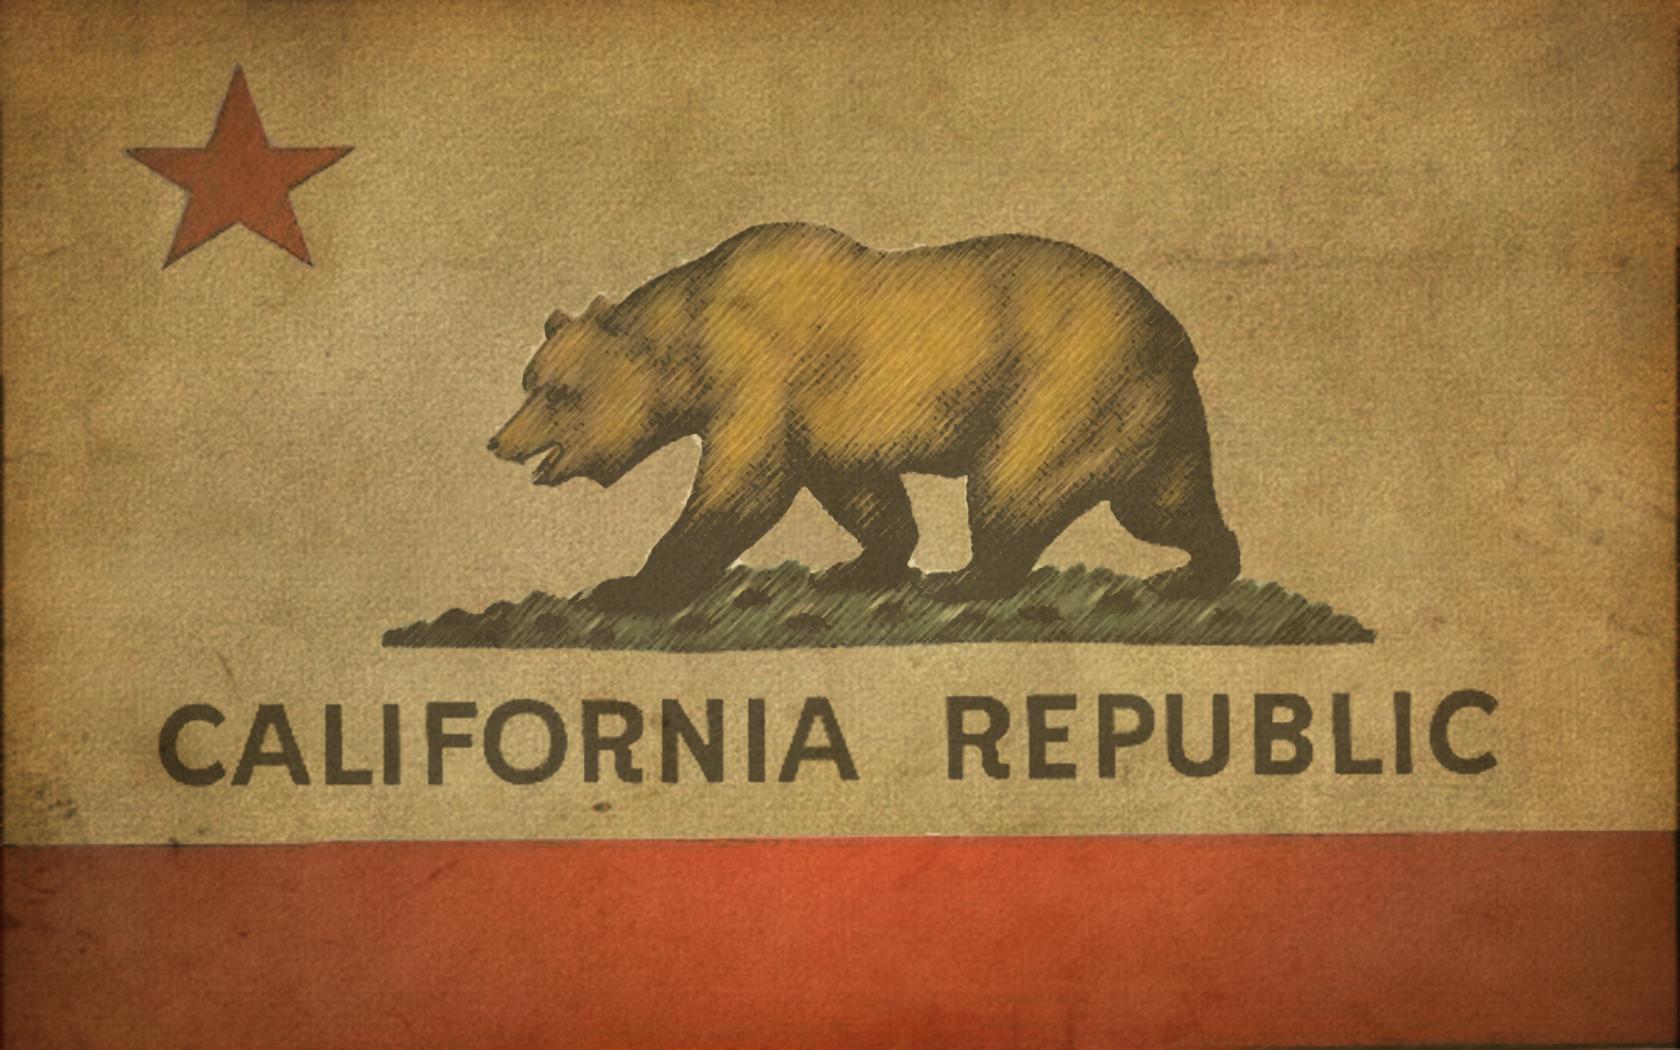 California Republic Wallpaper California Republic iPhone Wallpaper 1680x1050